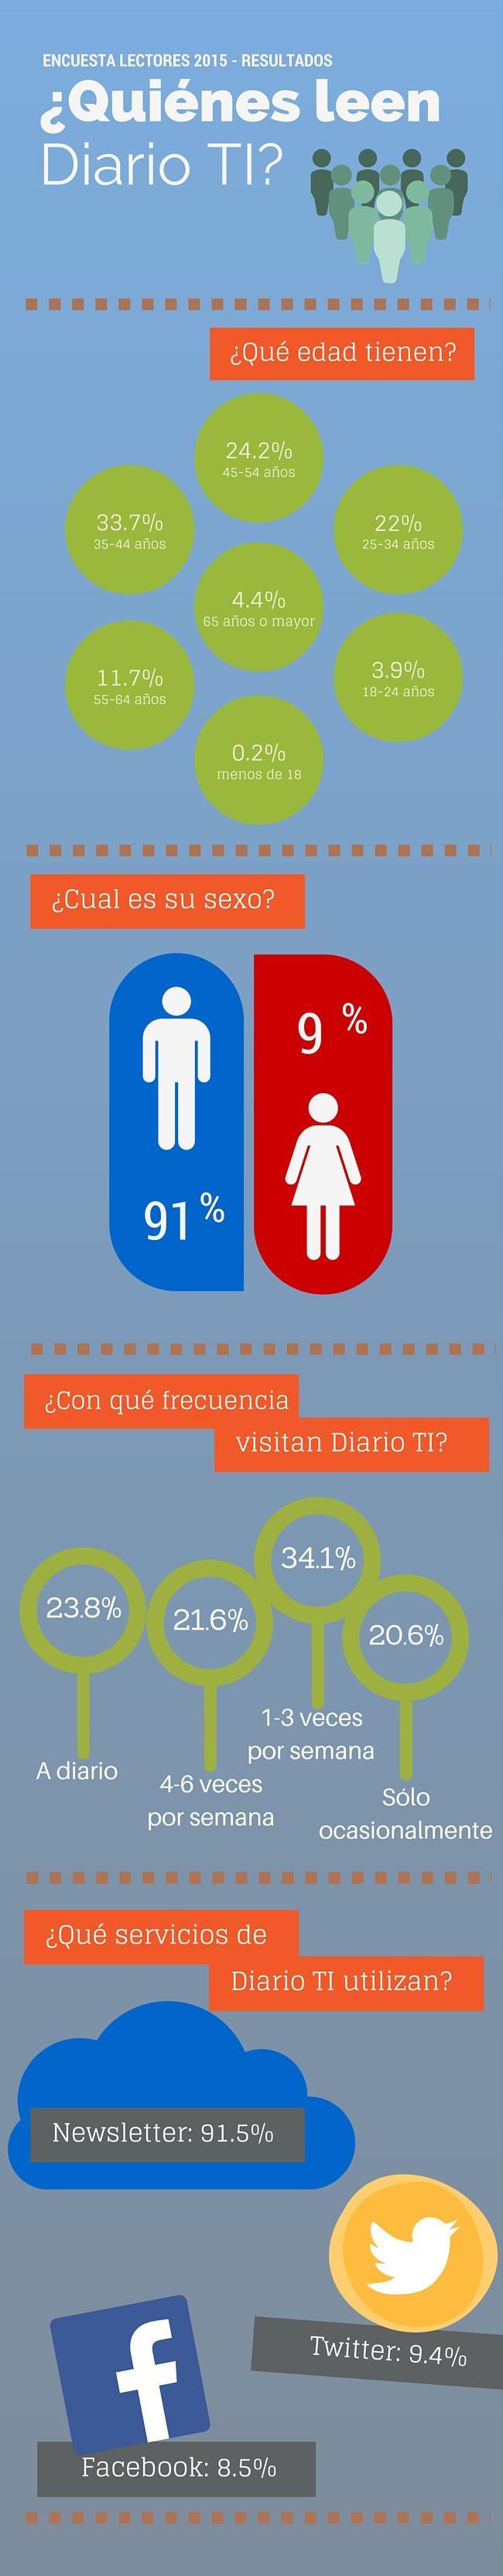 Infografía encuesta lectores Diario TI - 1